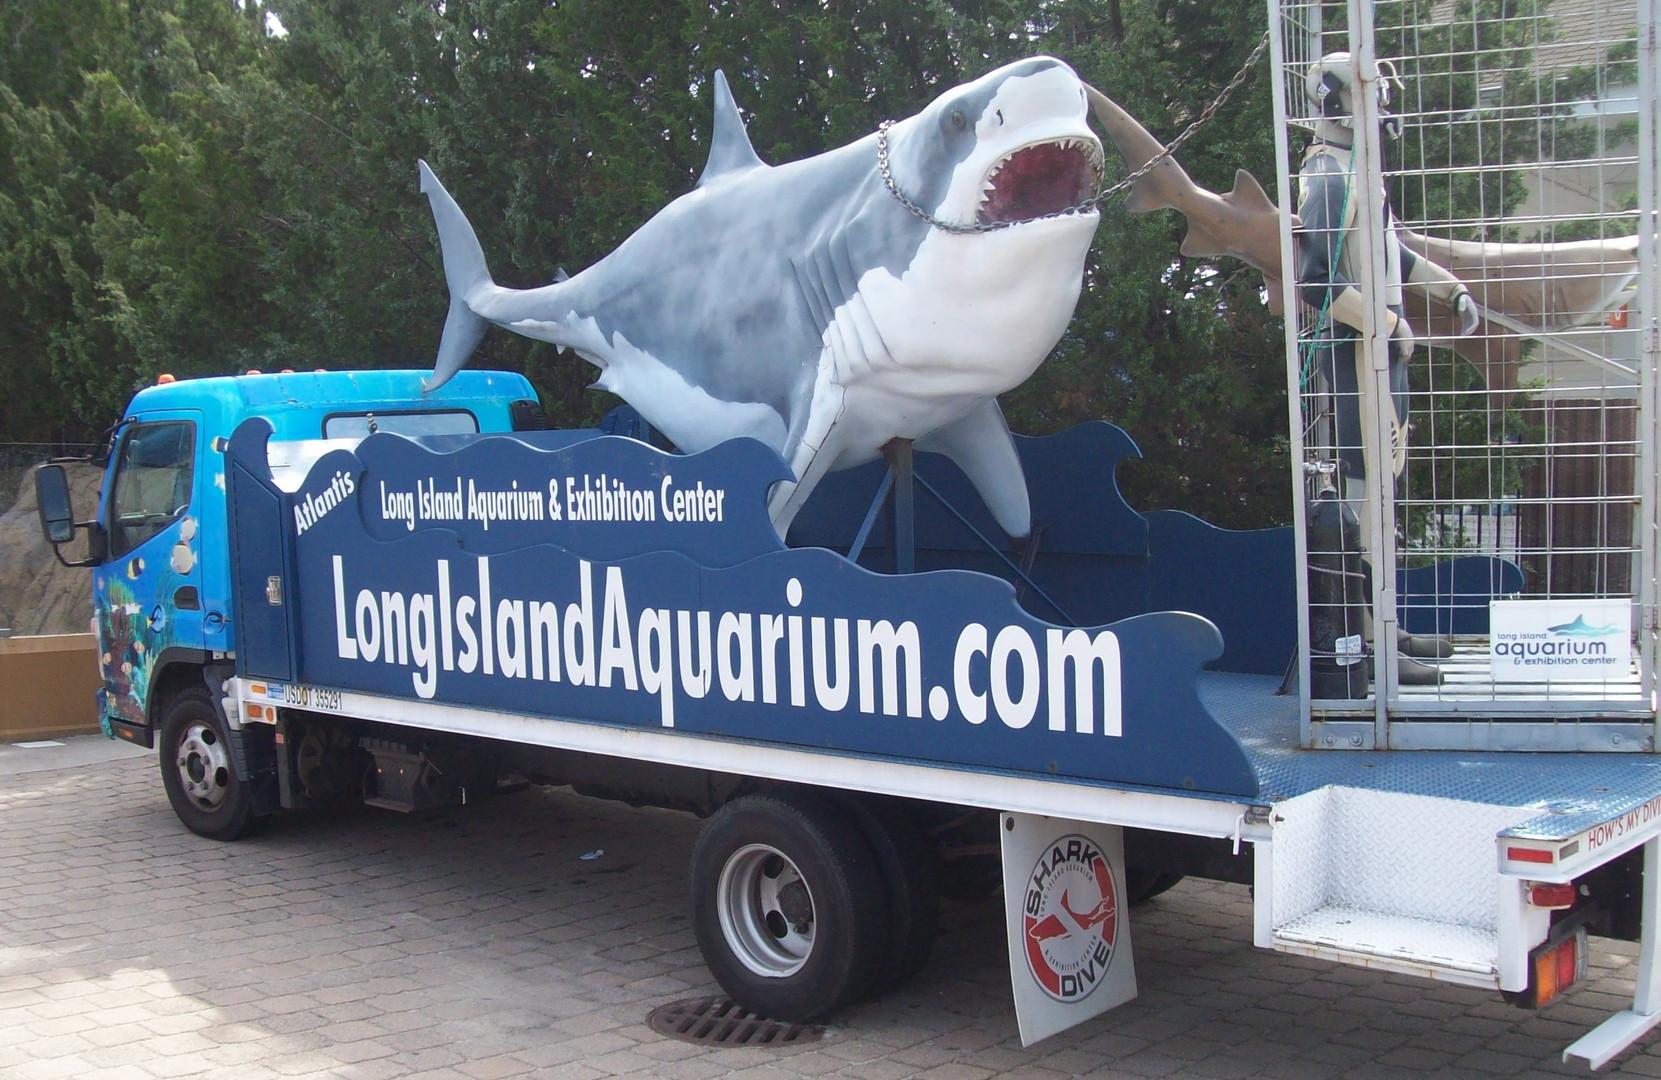 Truck with fiberglass great white shark